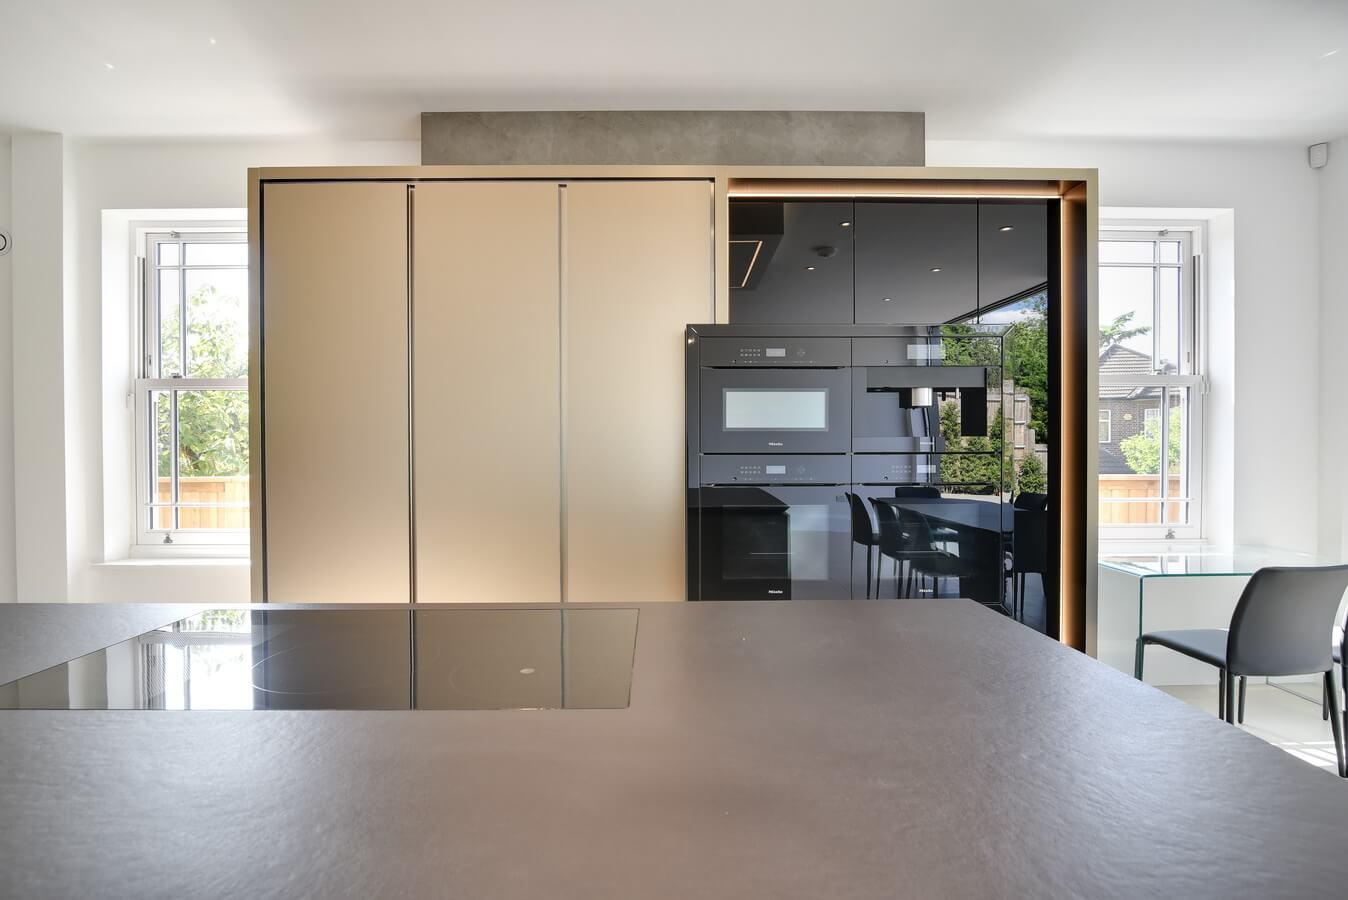 North-London-Warendorf-German-Kitchen-Wall-Units.jpg